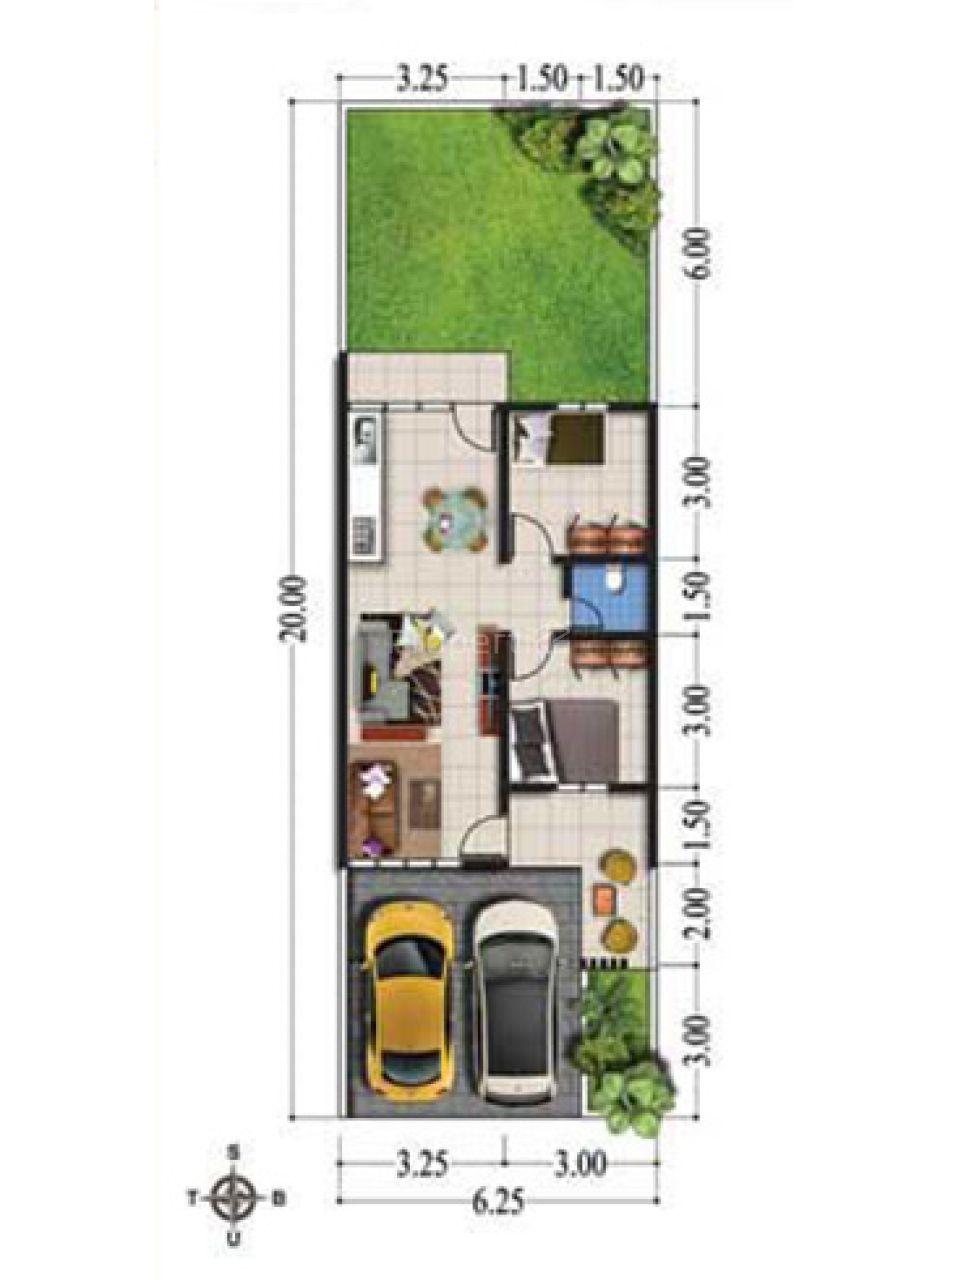 Rumah Baru Design Minimalis dalam Hunian Eksklusif di Jatiasih, Jawa Barat